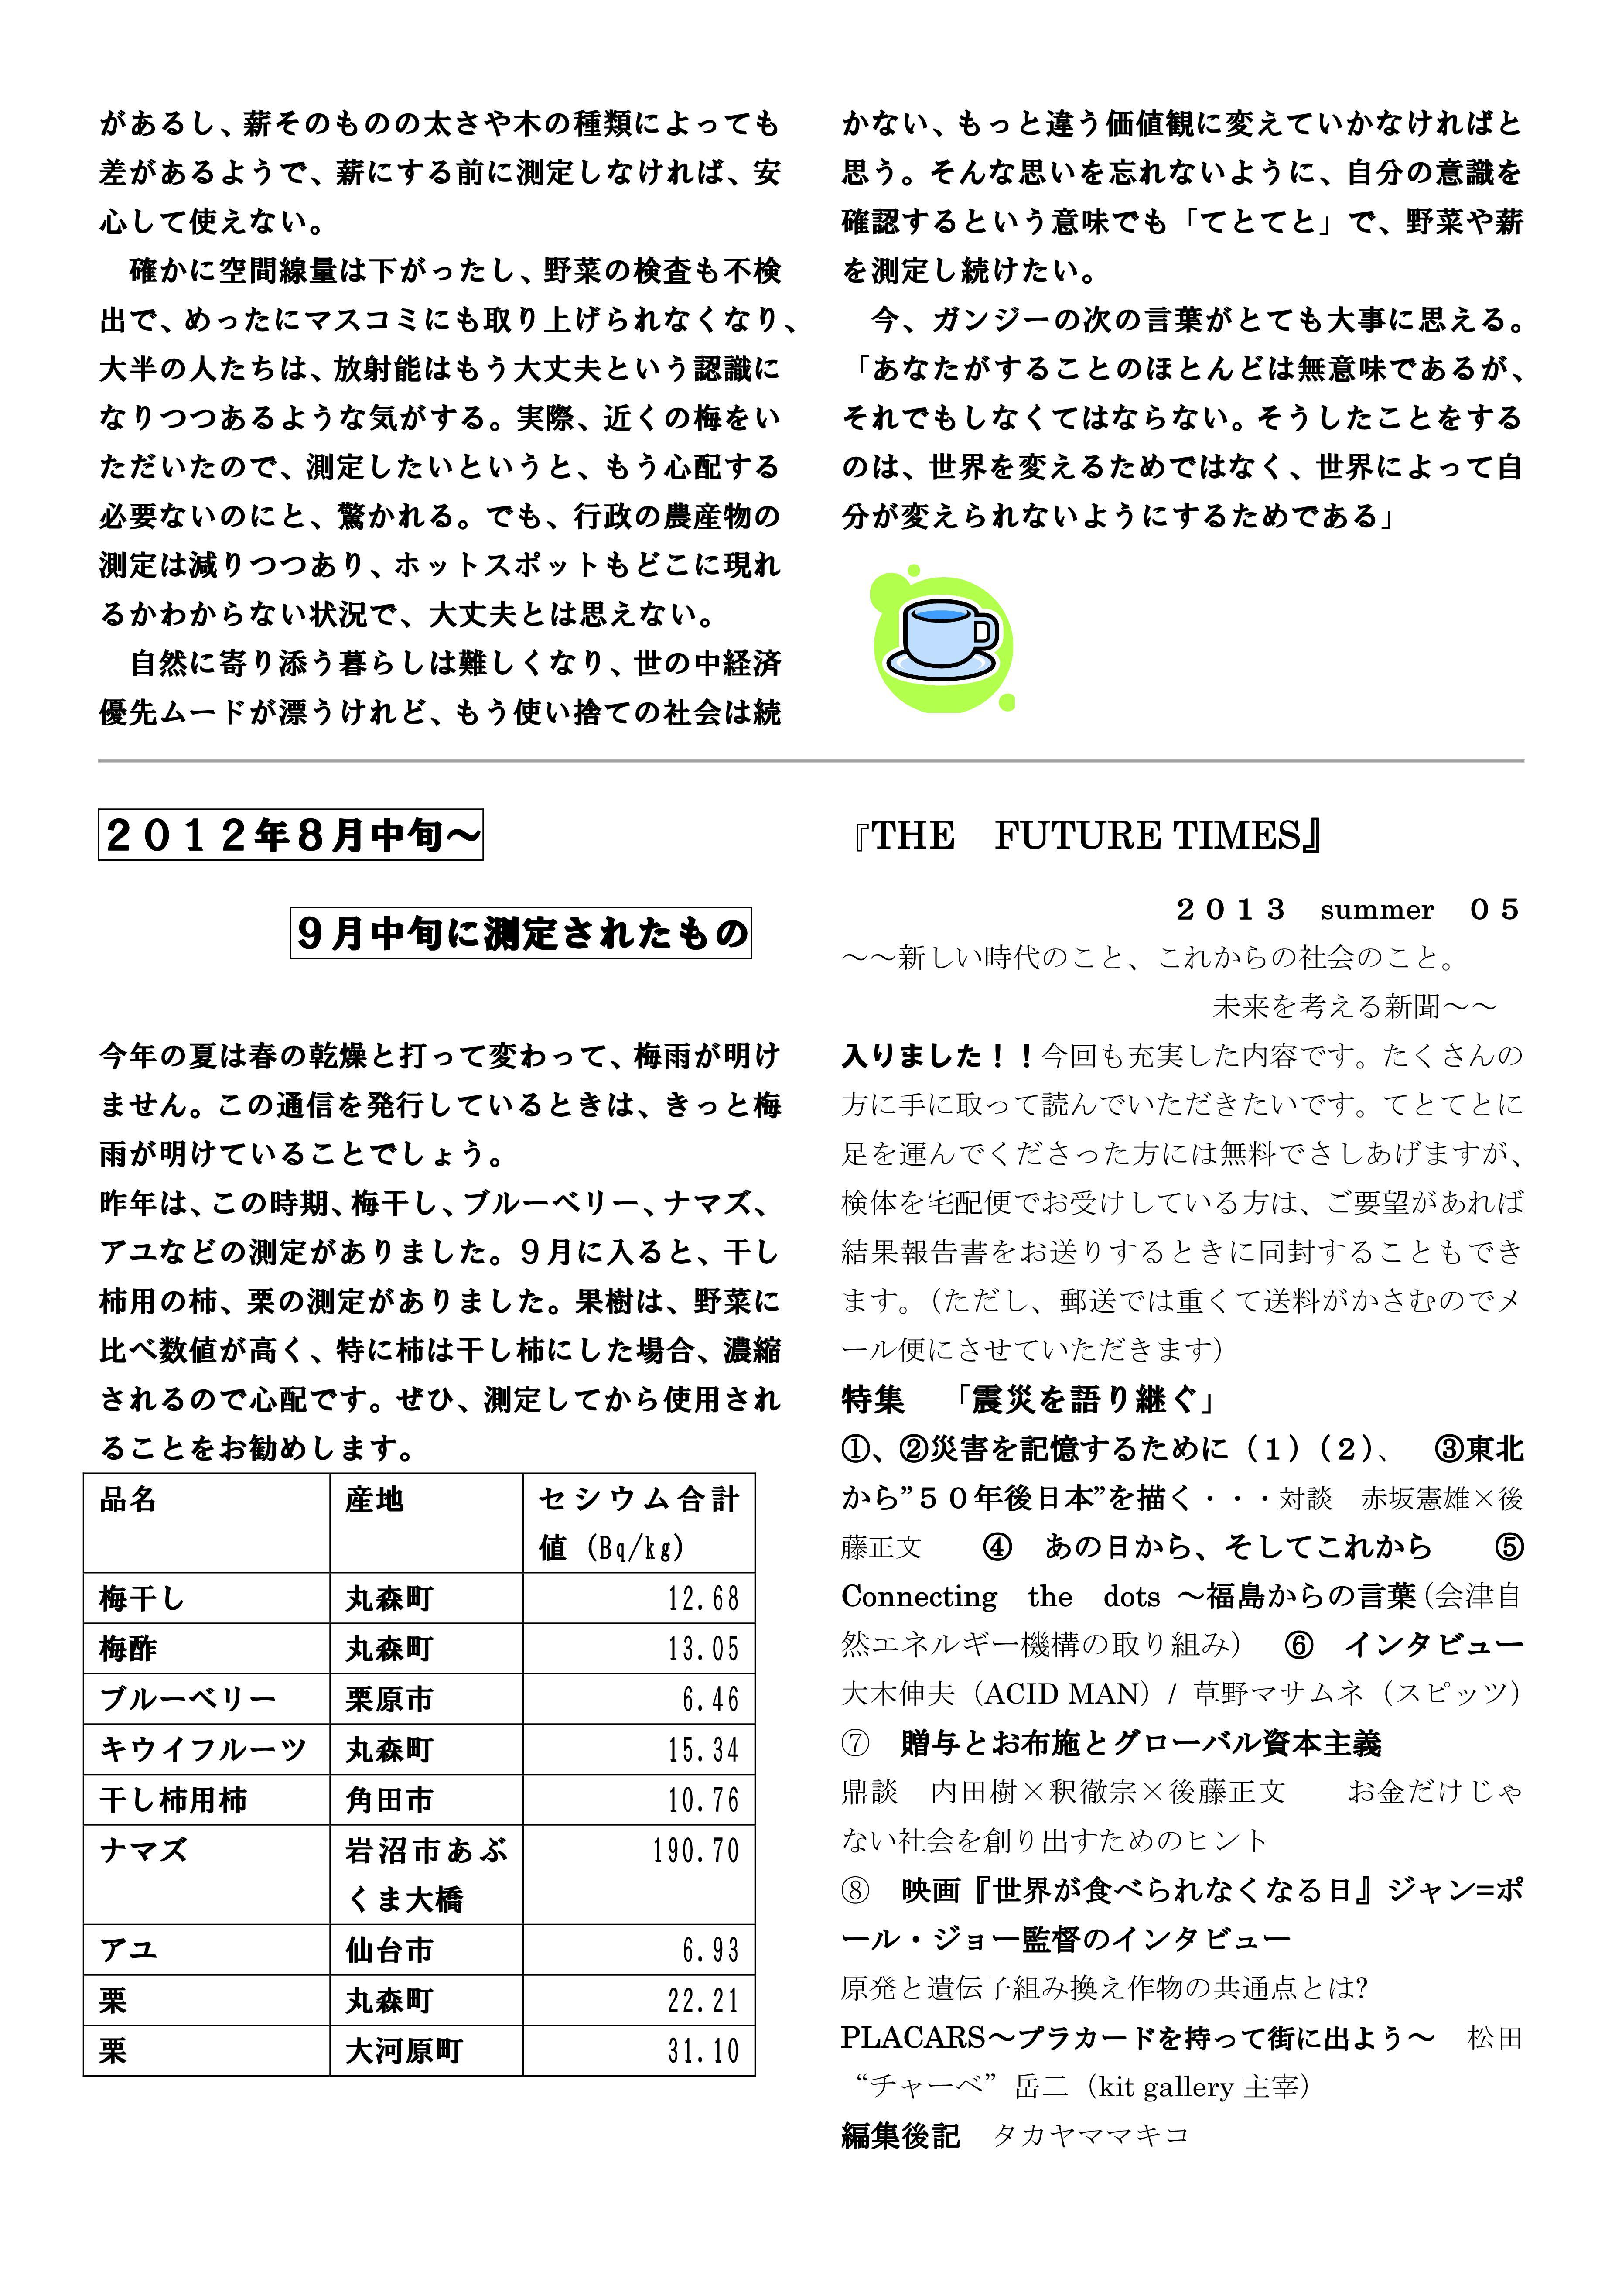 Microsoft Word - てとてとミニ通信 2013年8月(3)-002